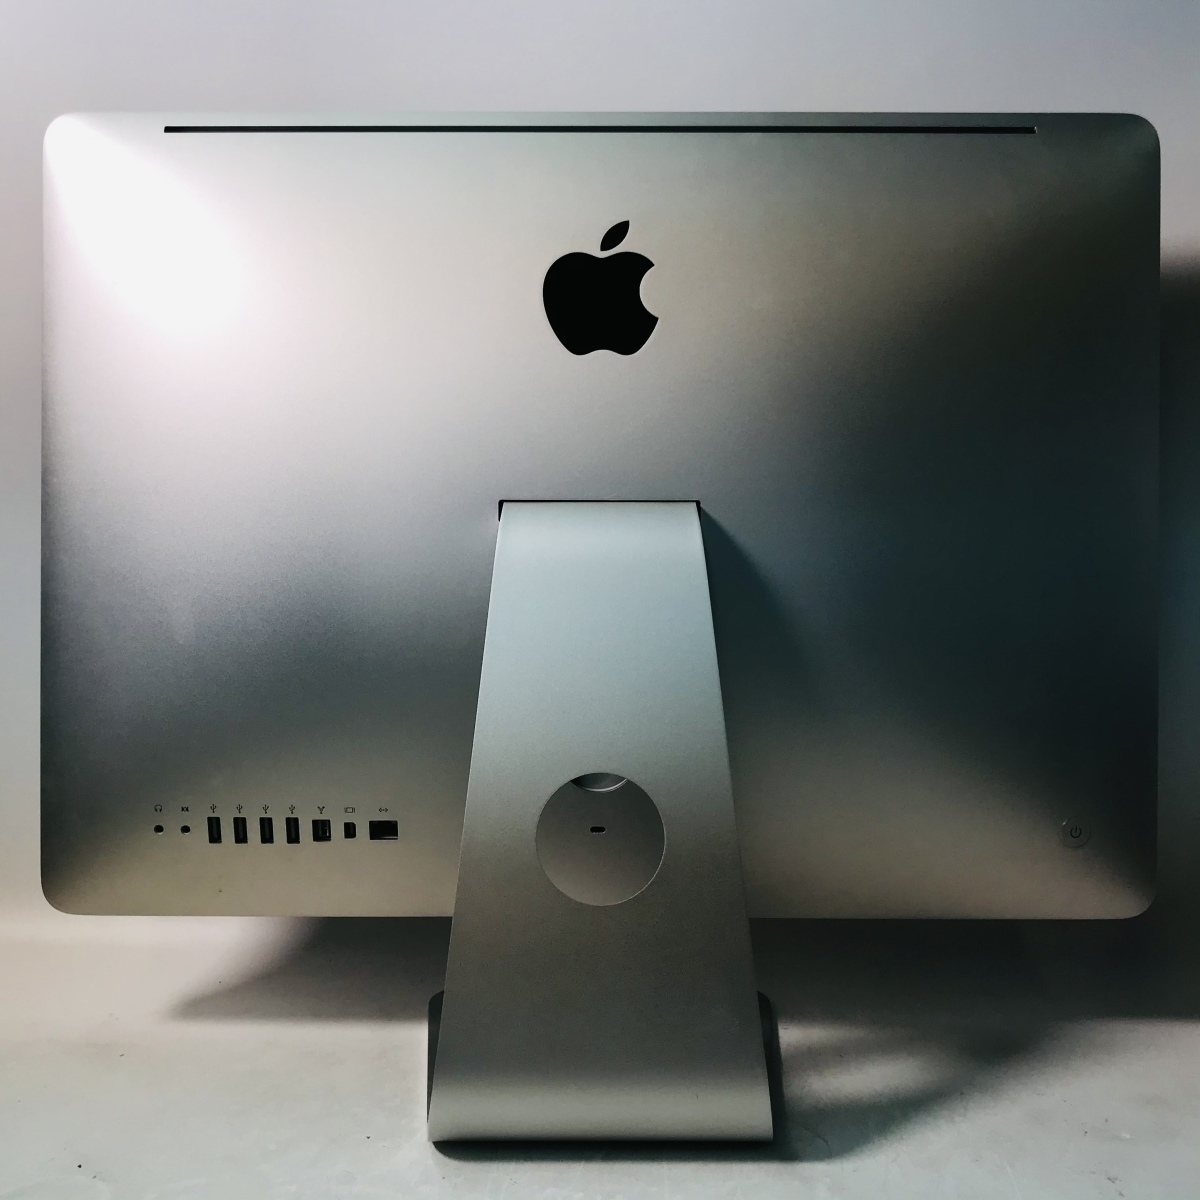 iMac 21.5インチ(Mid 2010) Core i3 3.2GHz/4GB/1TB MC509J/A 動作確認済み_画像4